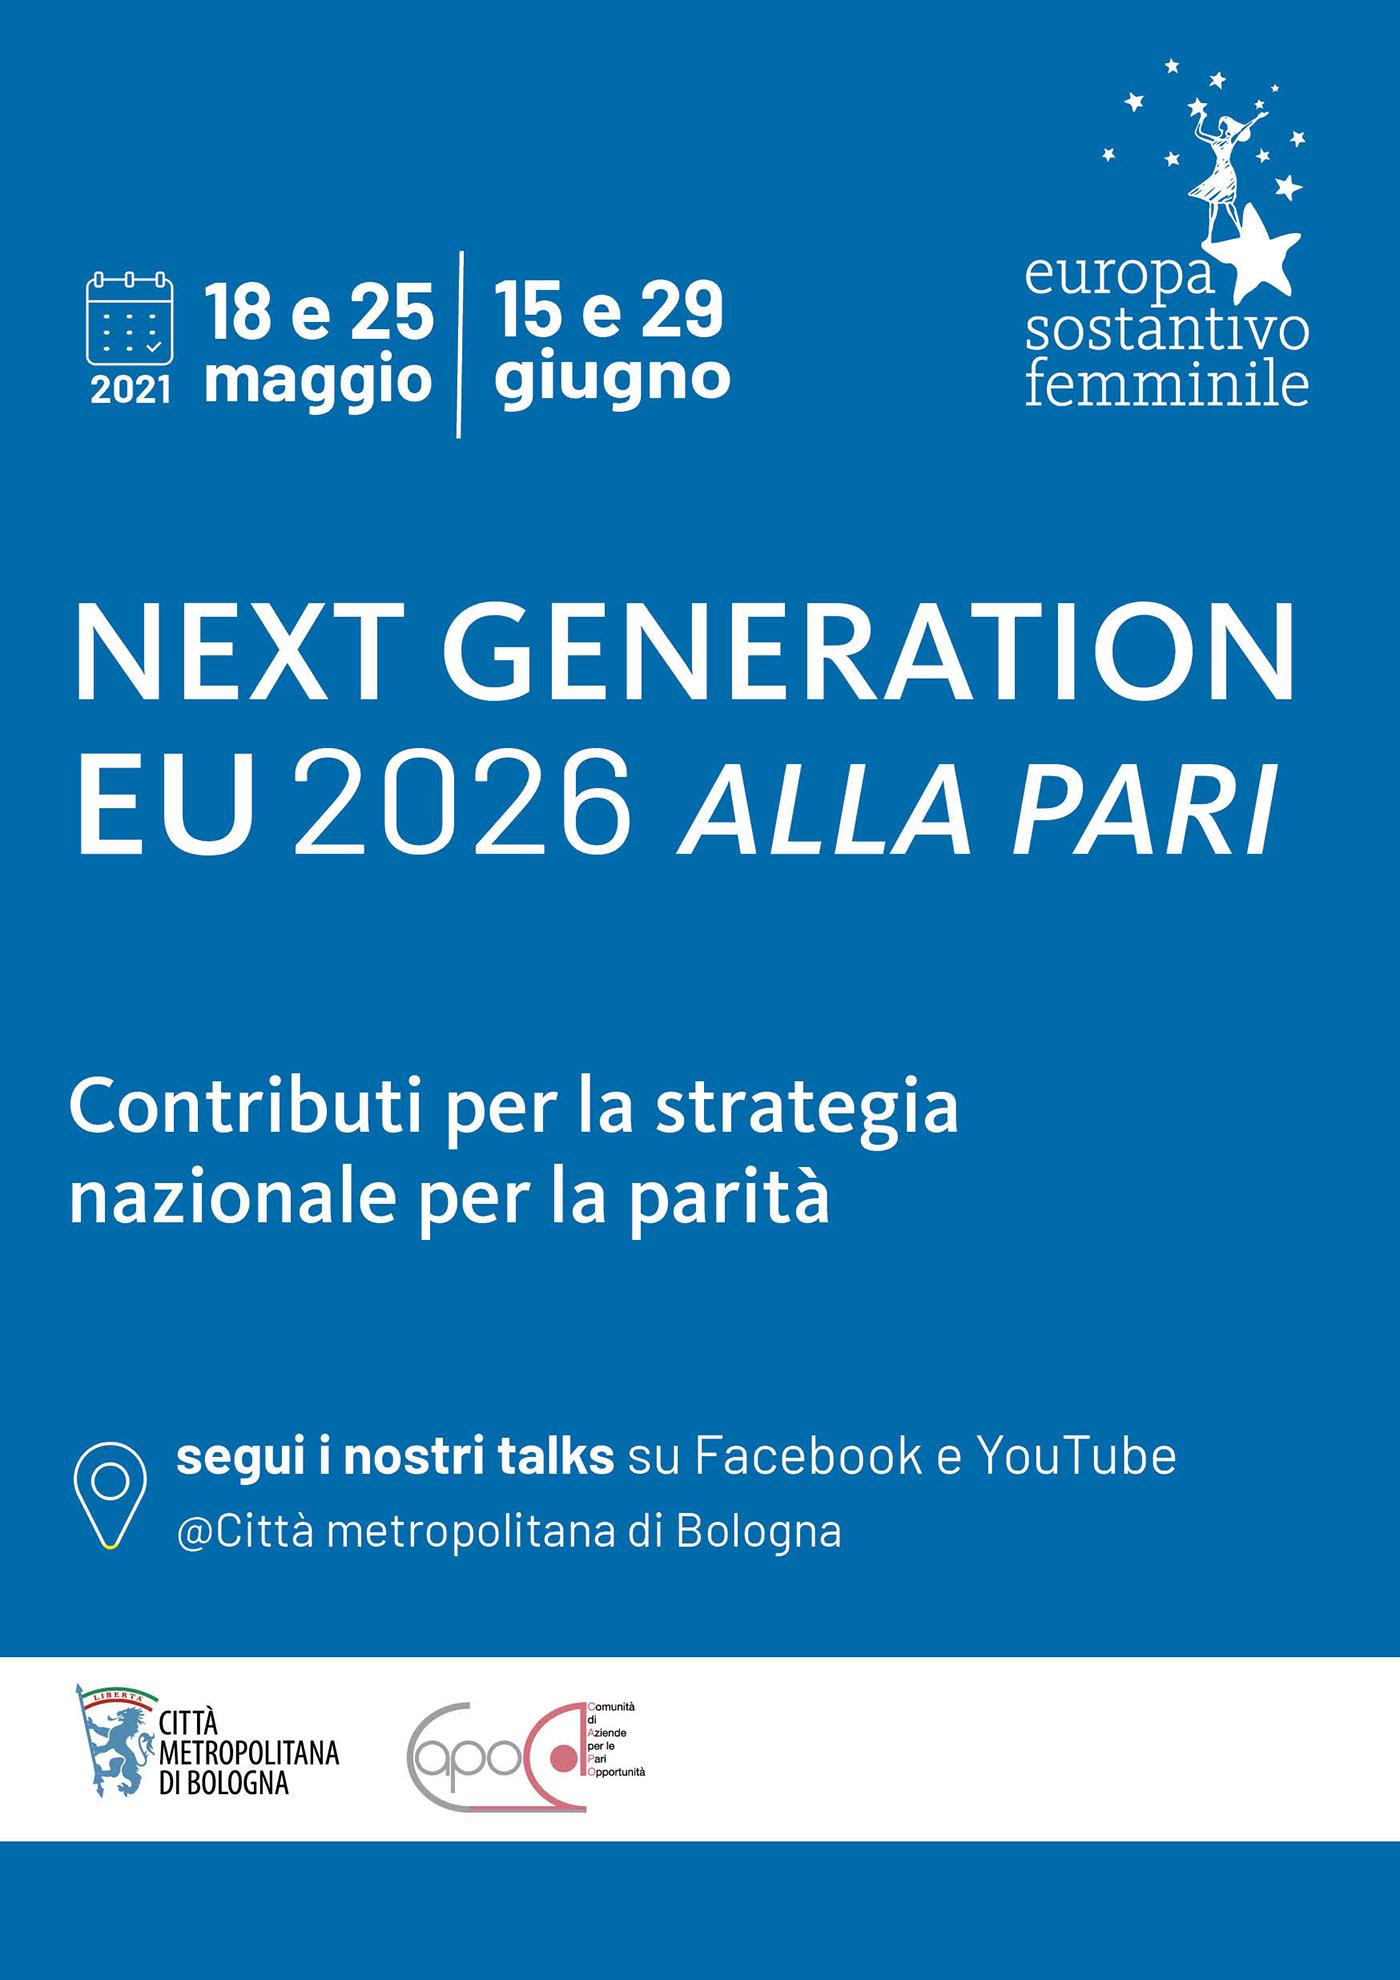 Next Generation EU 2026